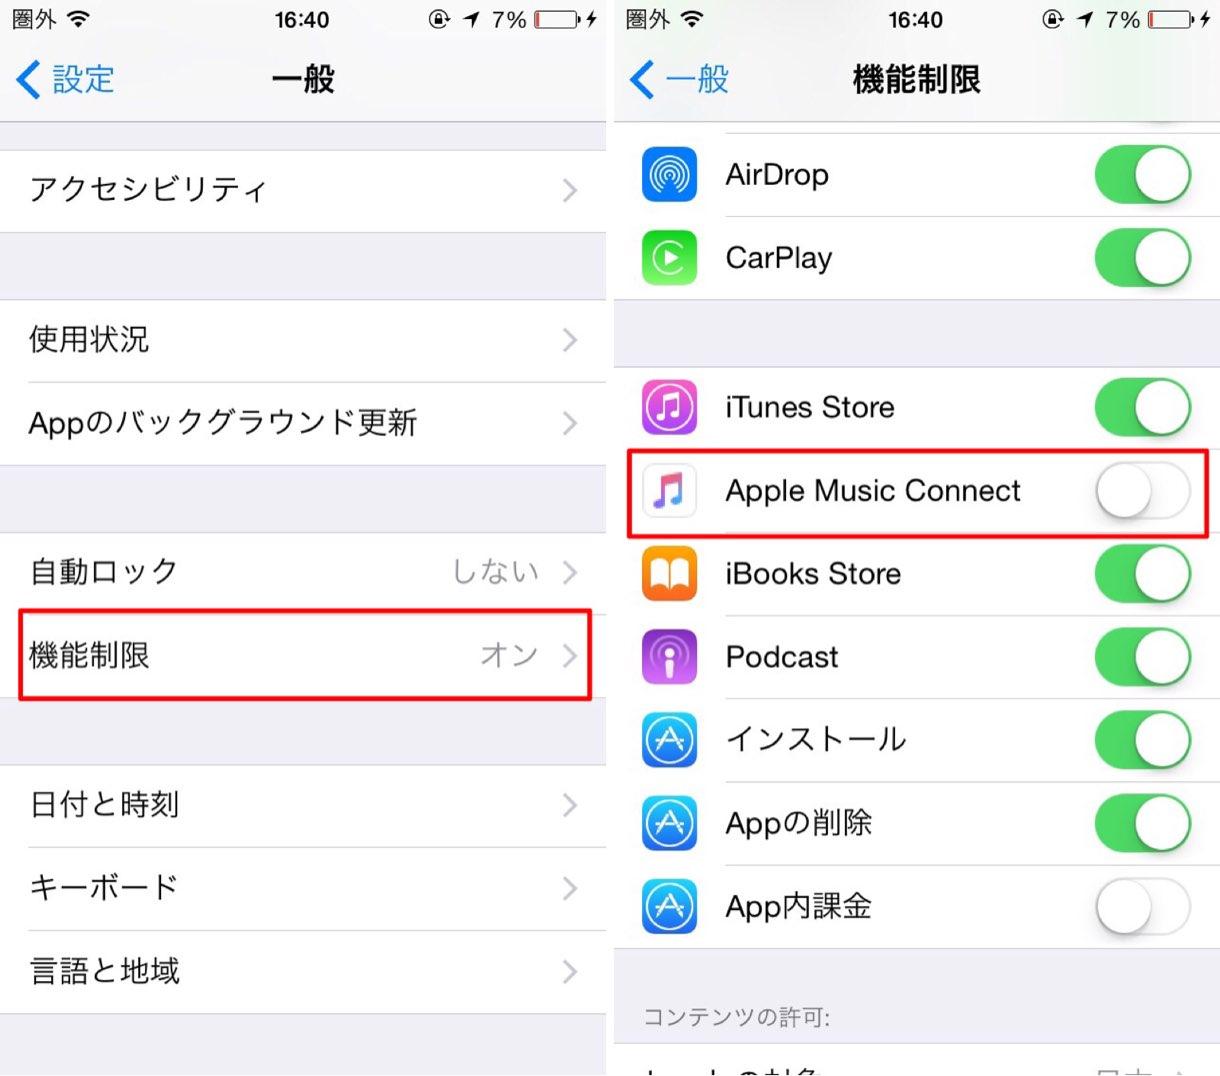 Apple Music Connectの非表示の設定